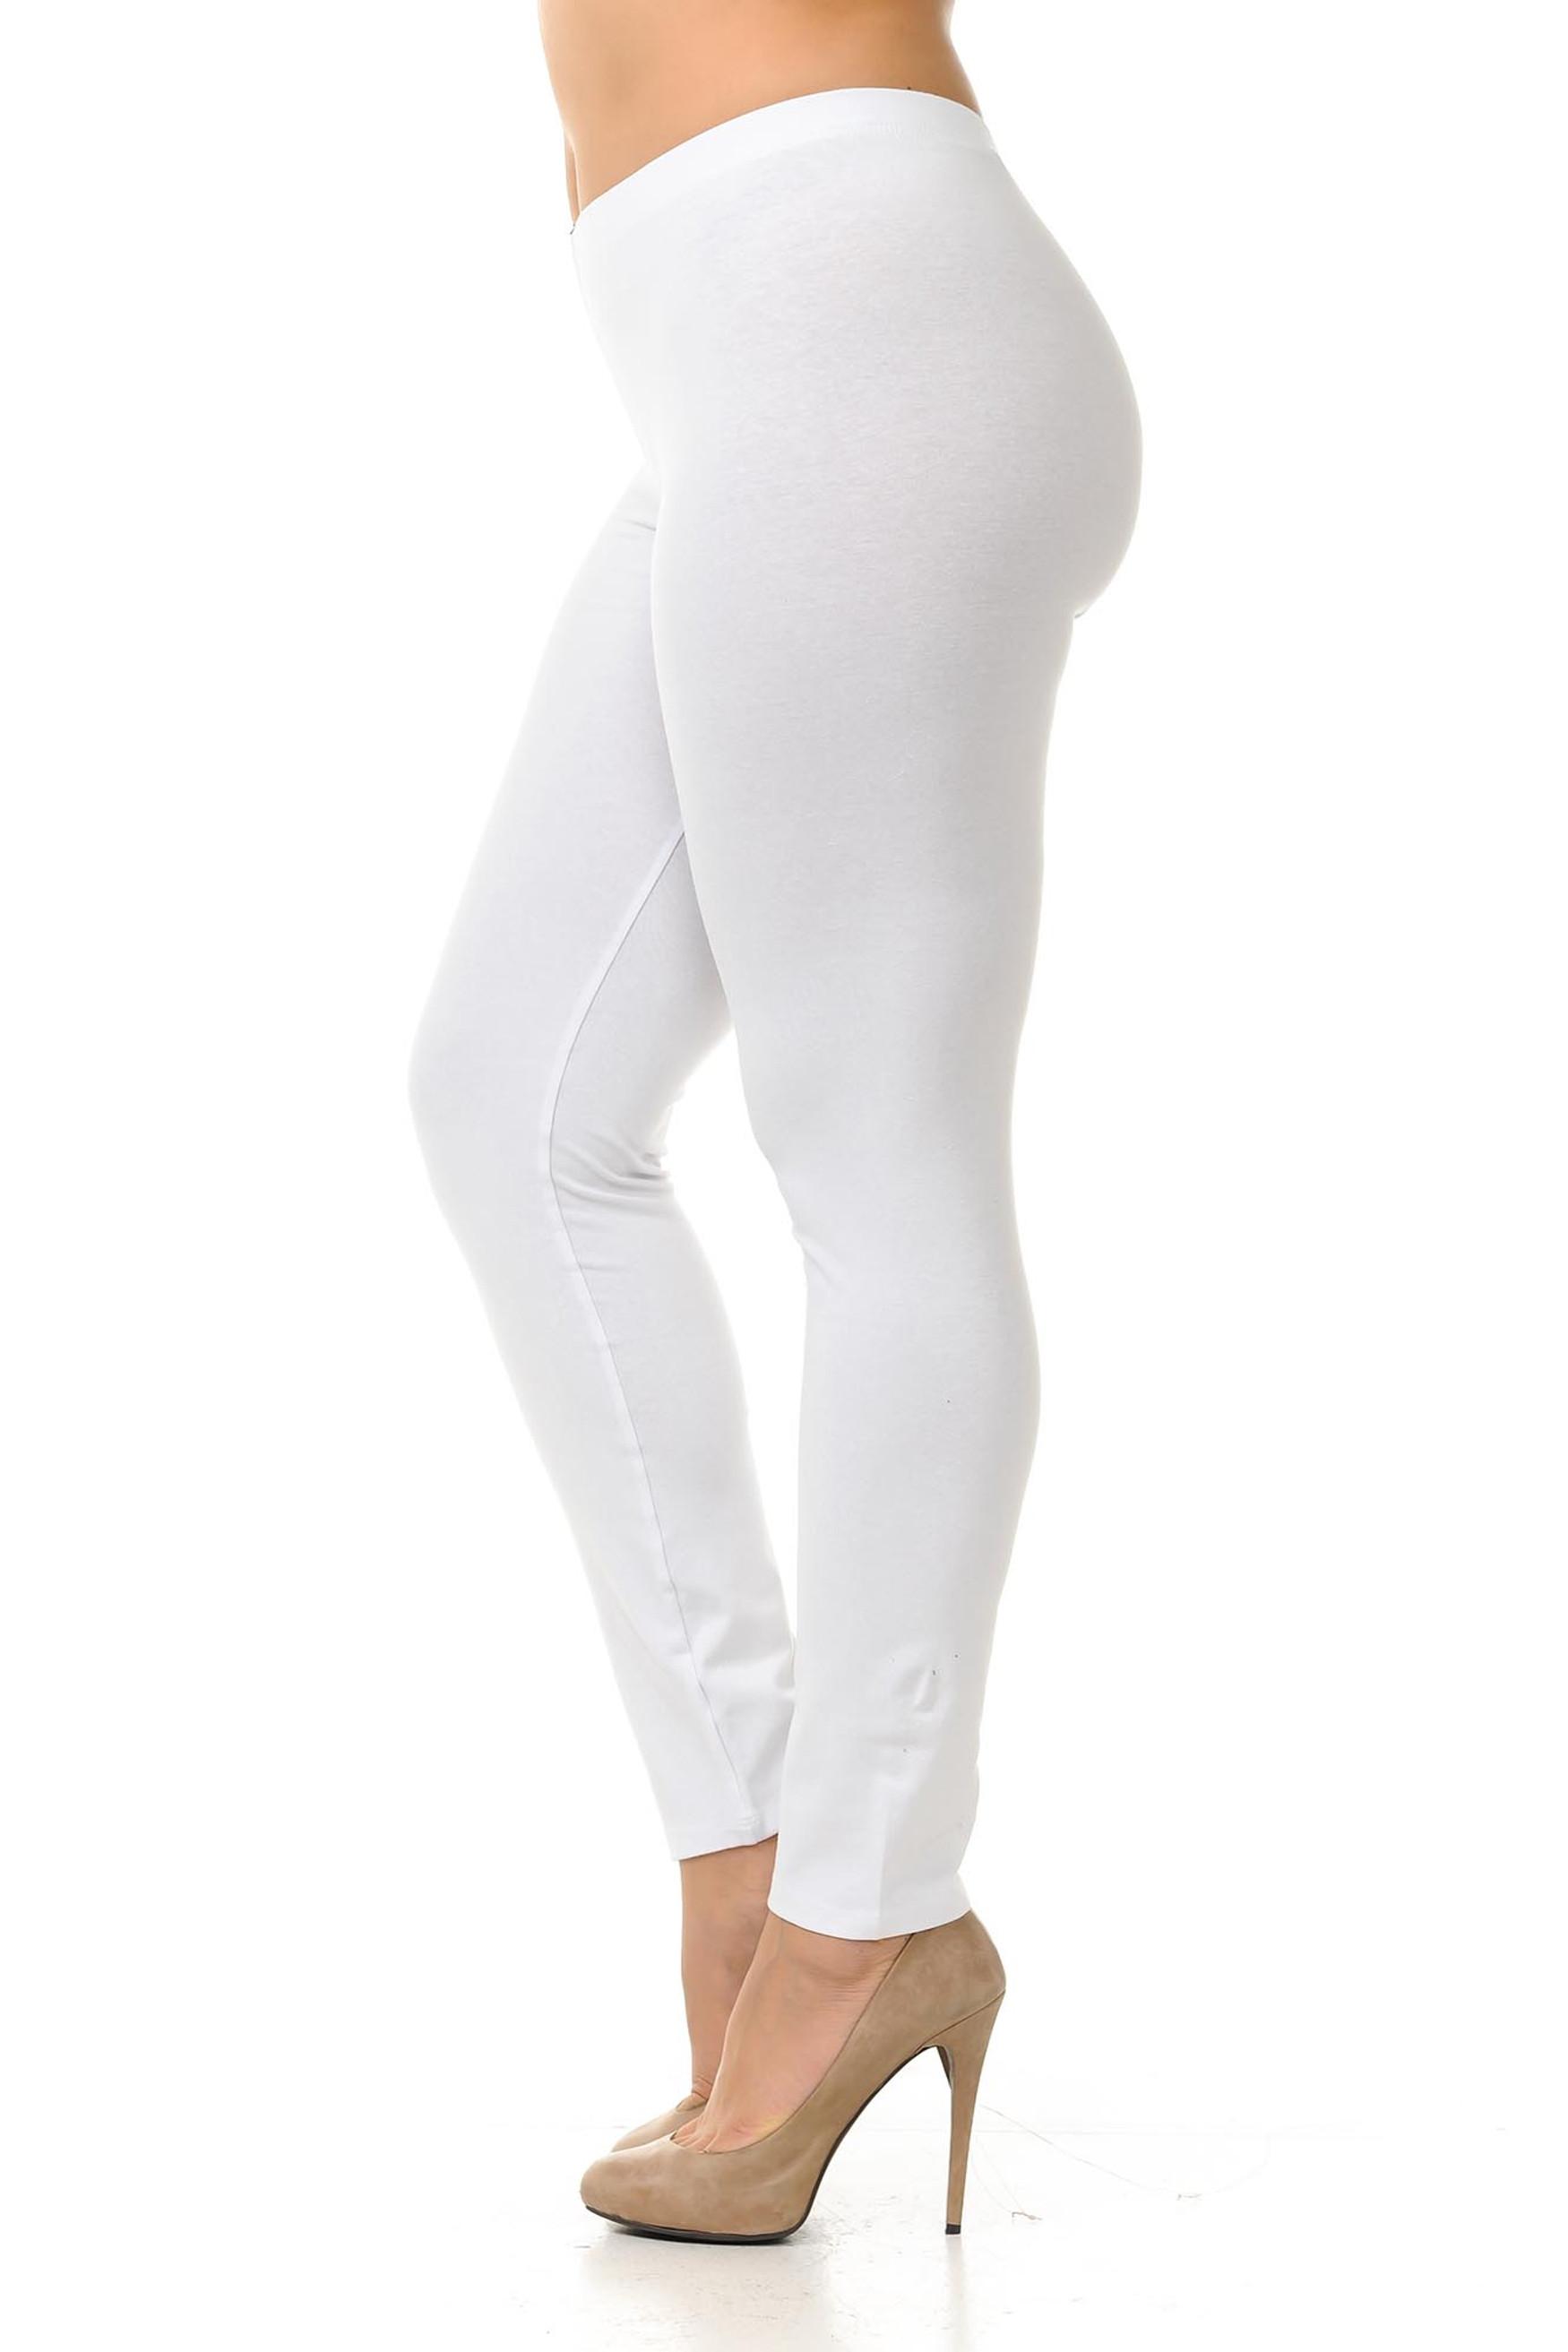 Left side view of  white plus size USA Cotton Full Length Leggings.